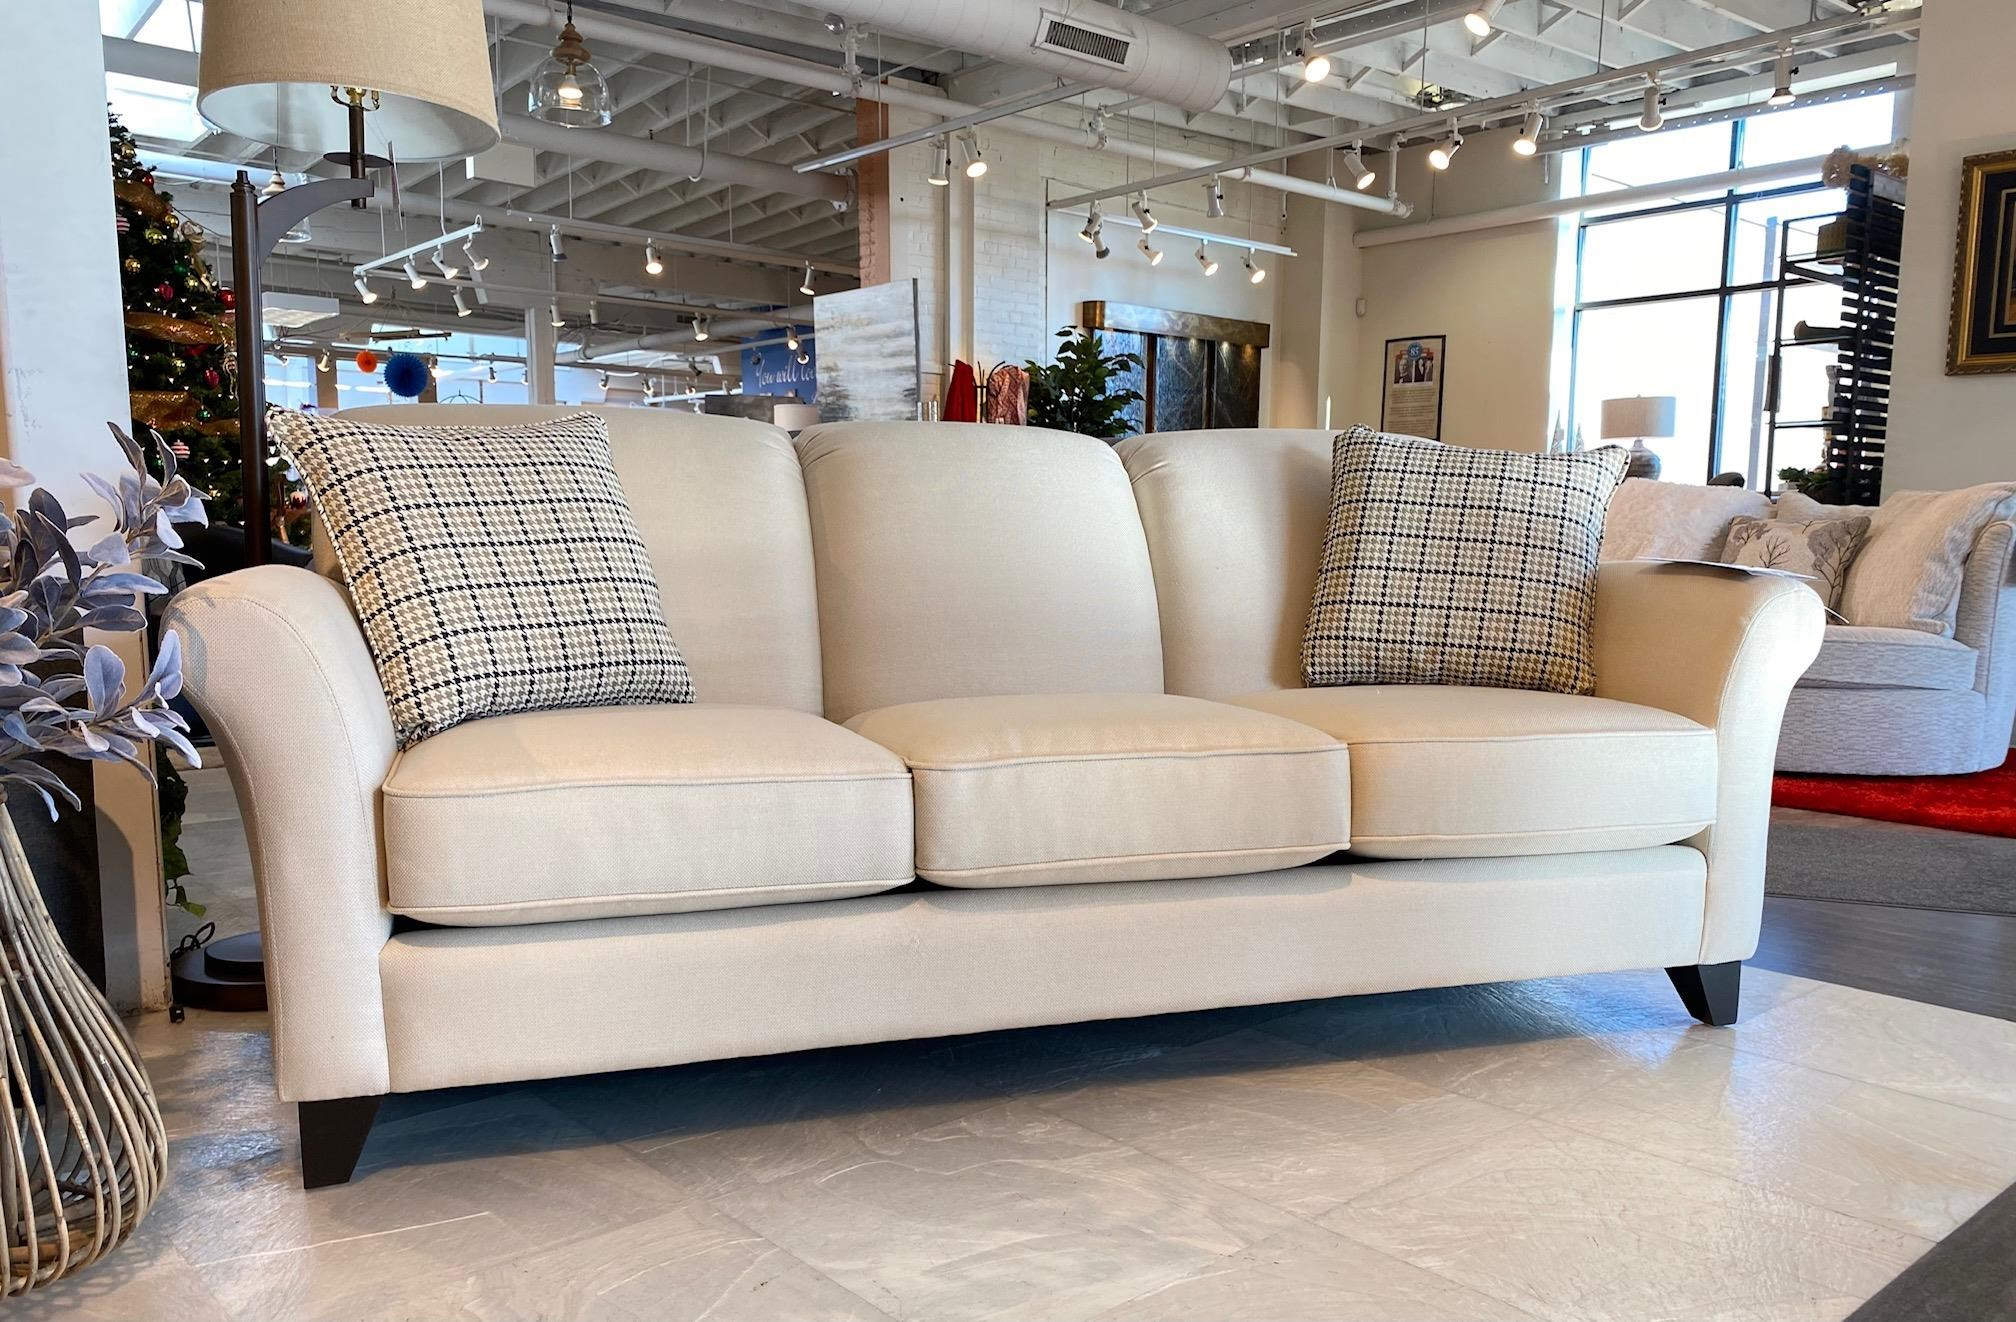 Beckett Sofa by Taelor Designs at Bennett's Furniture and Mattresses